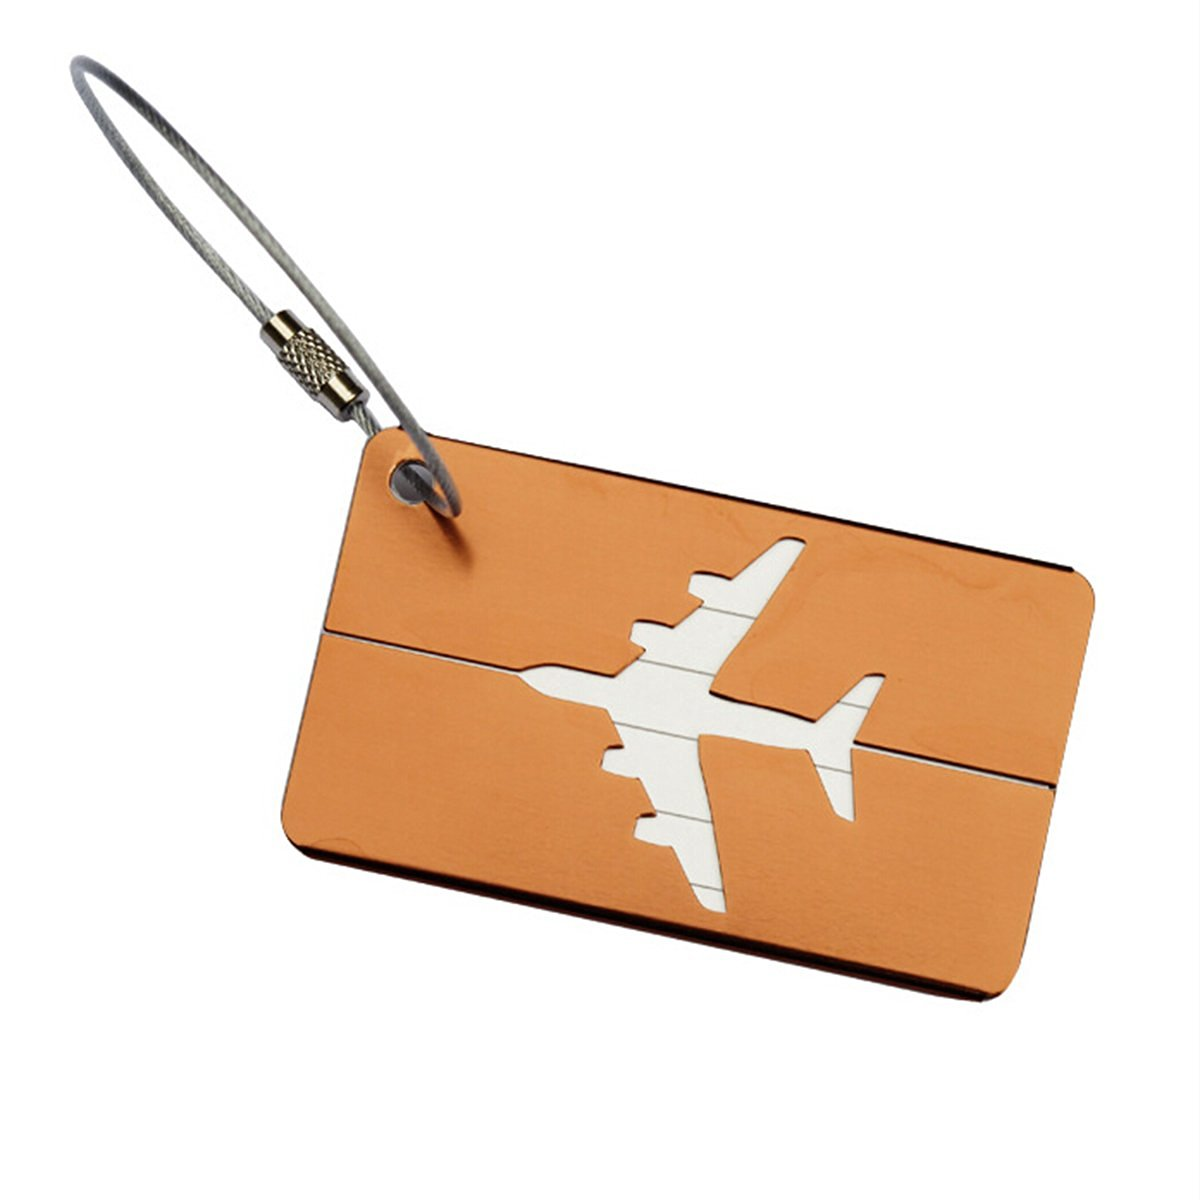 PIXNOR Luggage Tag with Key Ring Travel ID Bag Tag (Coffee)